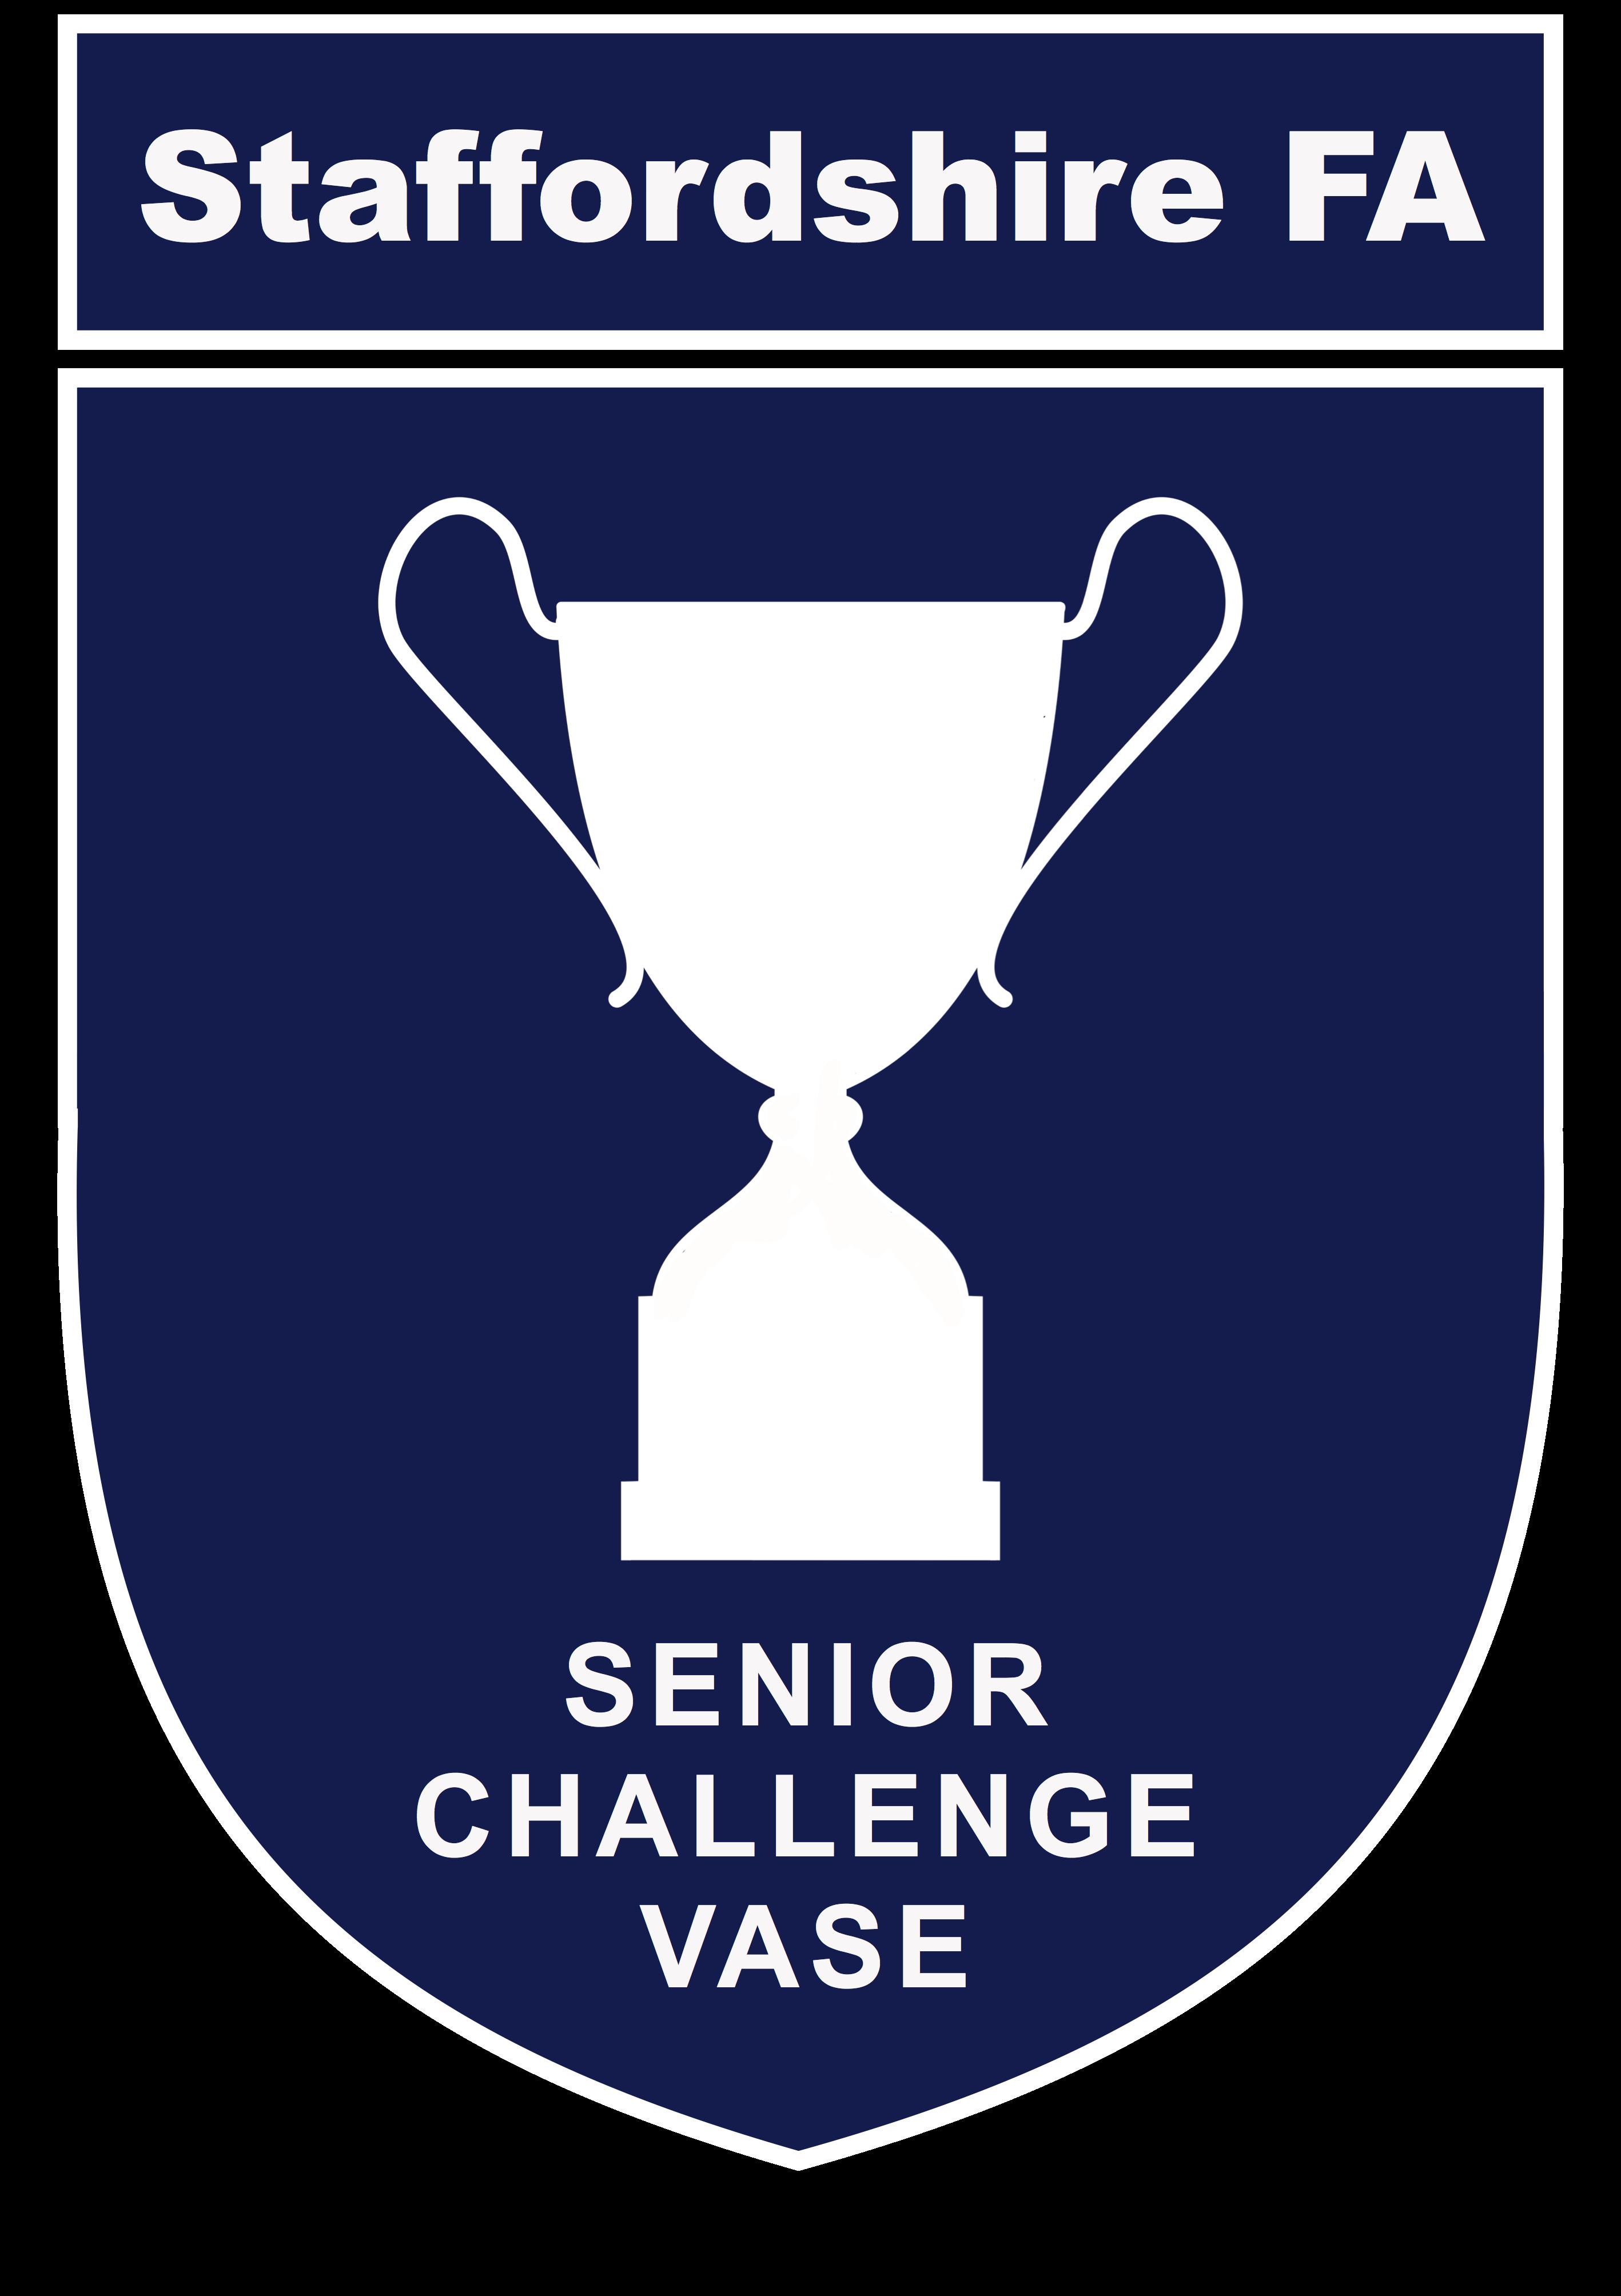 Senior Challenge Vase - Staffordshire FA